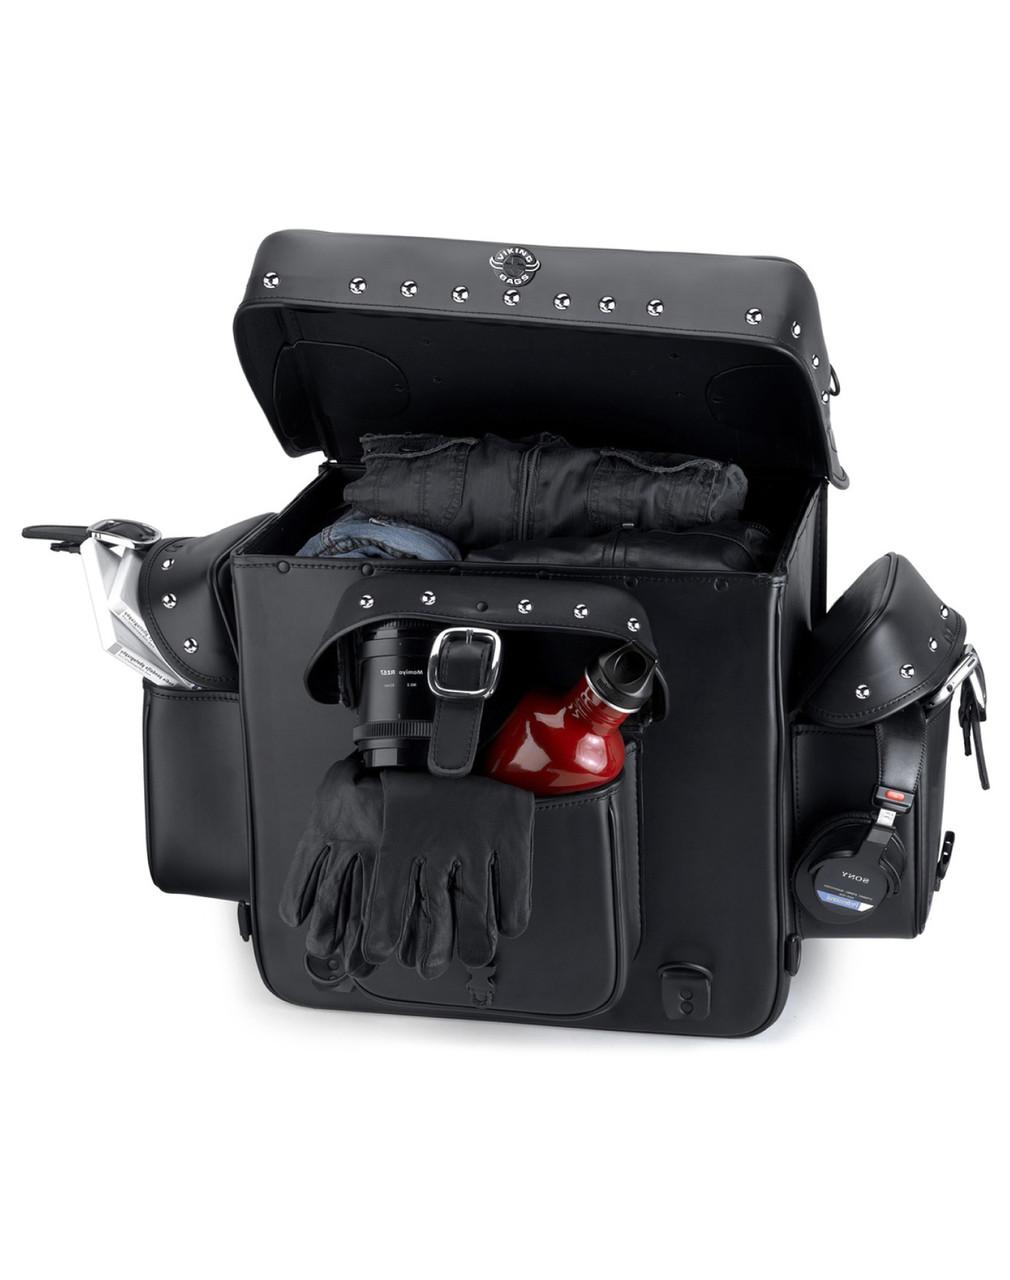 Viking Revival Series Studded Motorcycle Sissy Bar Bag Storage